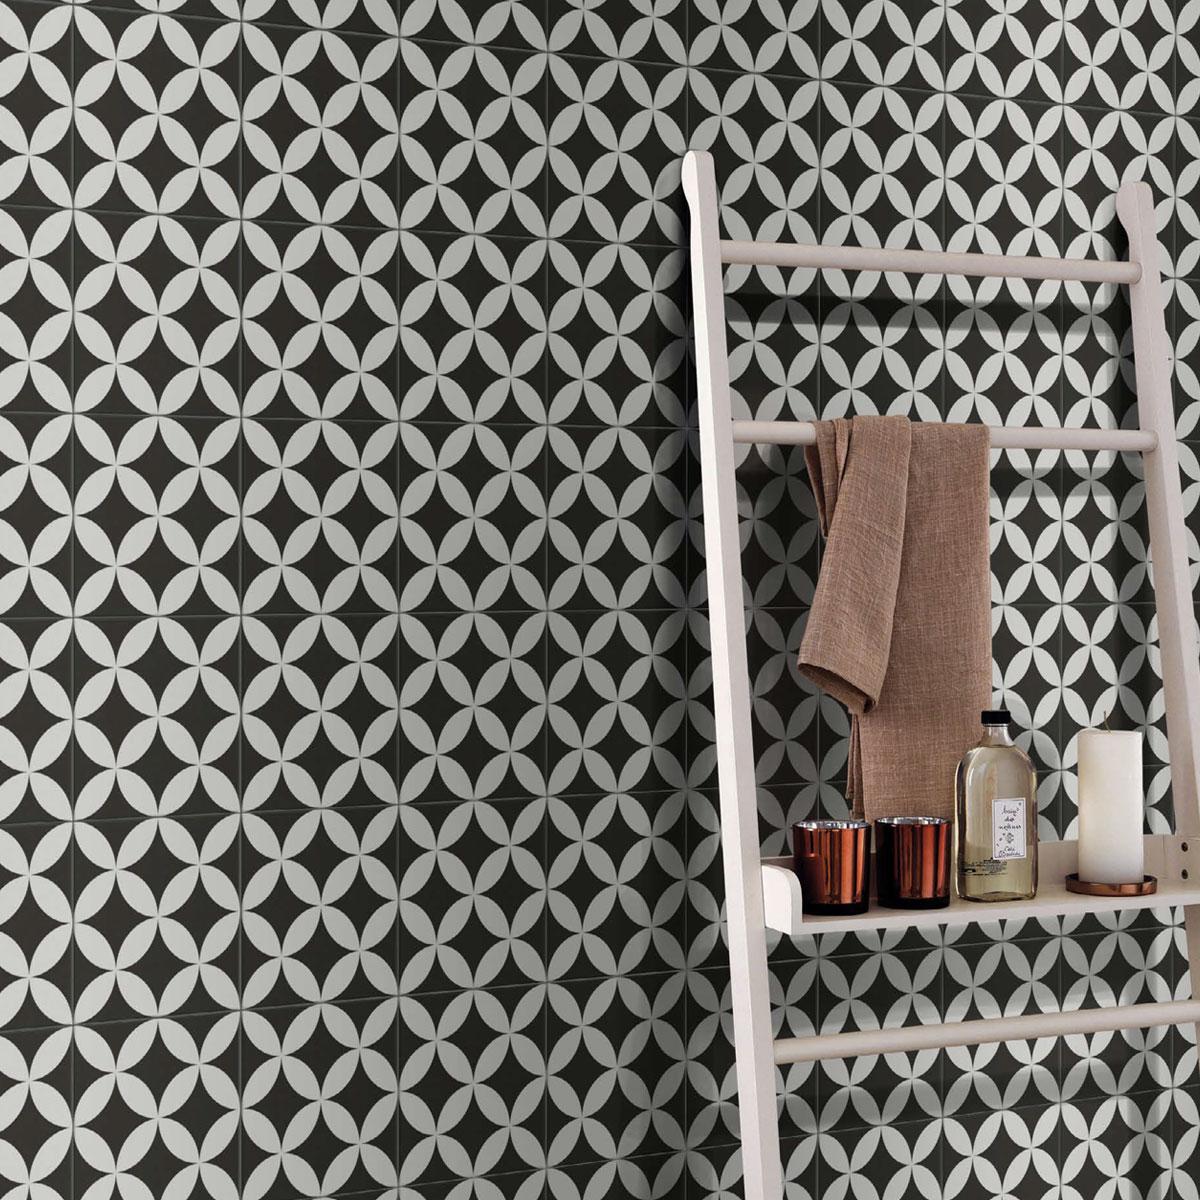 Picasso Evolution - Star Black - Patterned Tiles - Stone3 Brisbane